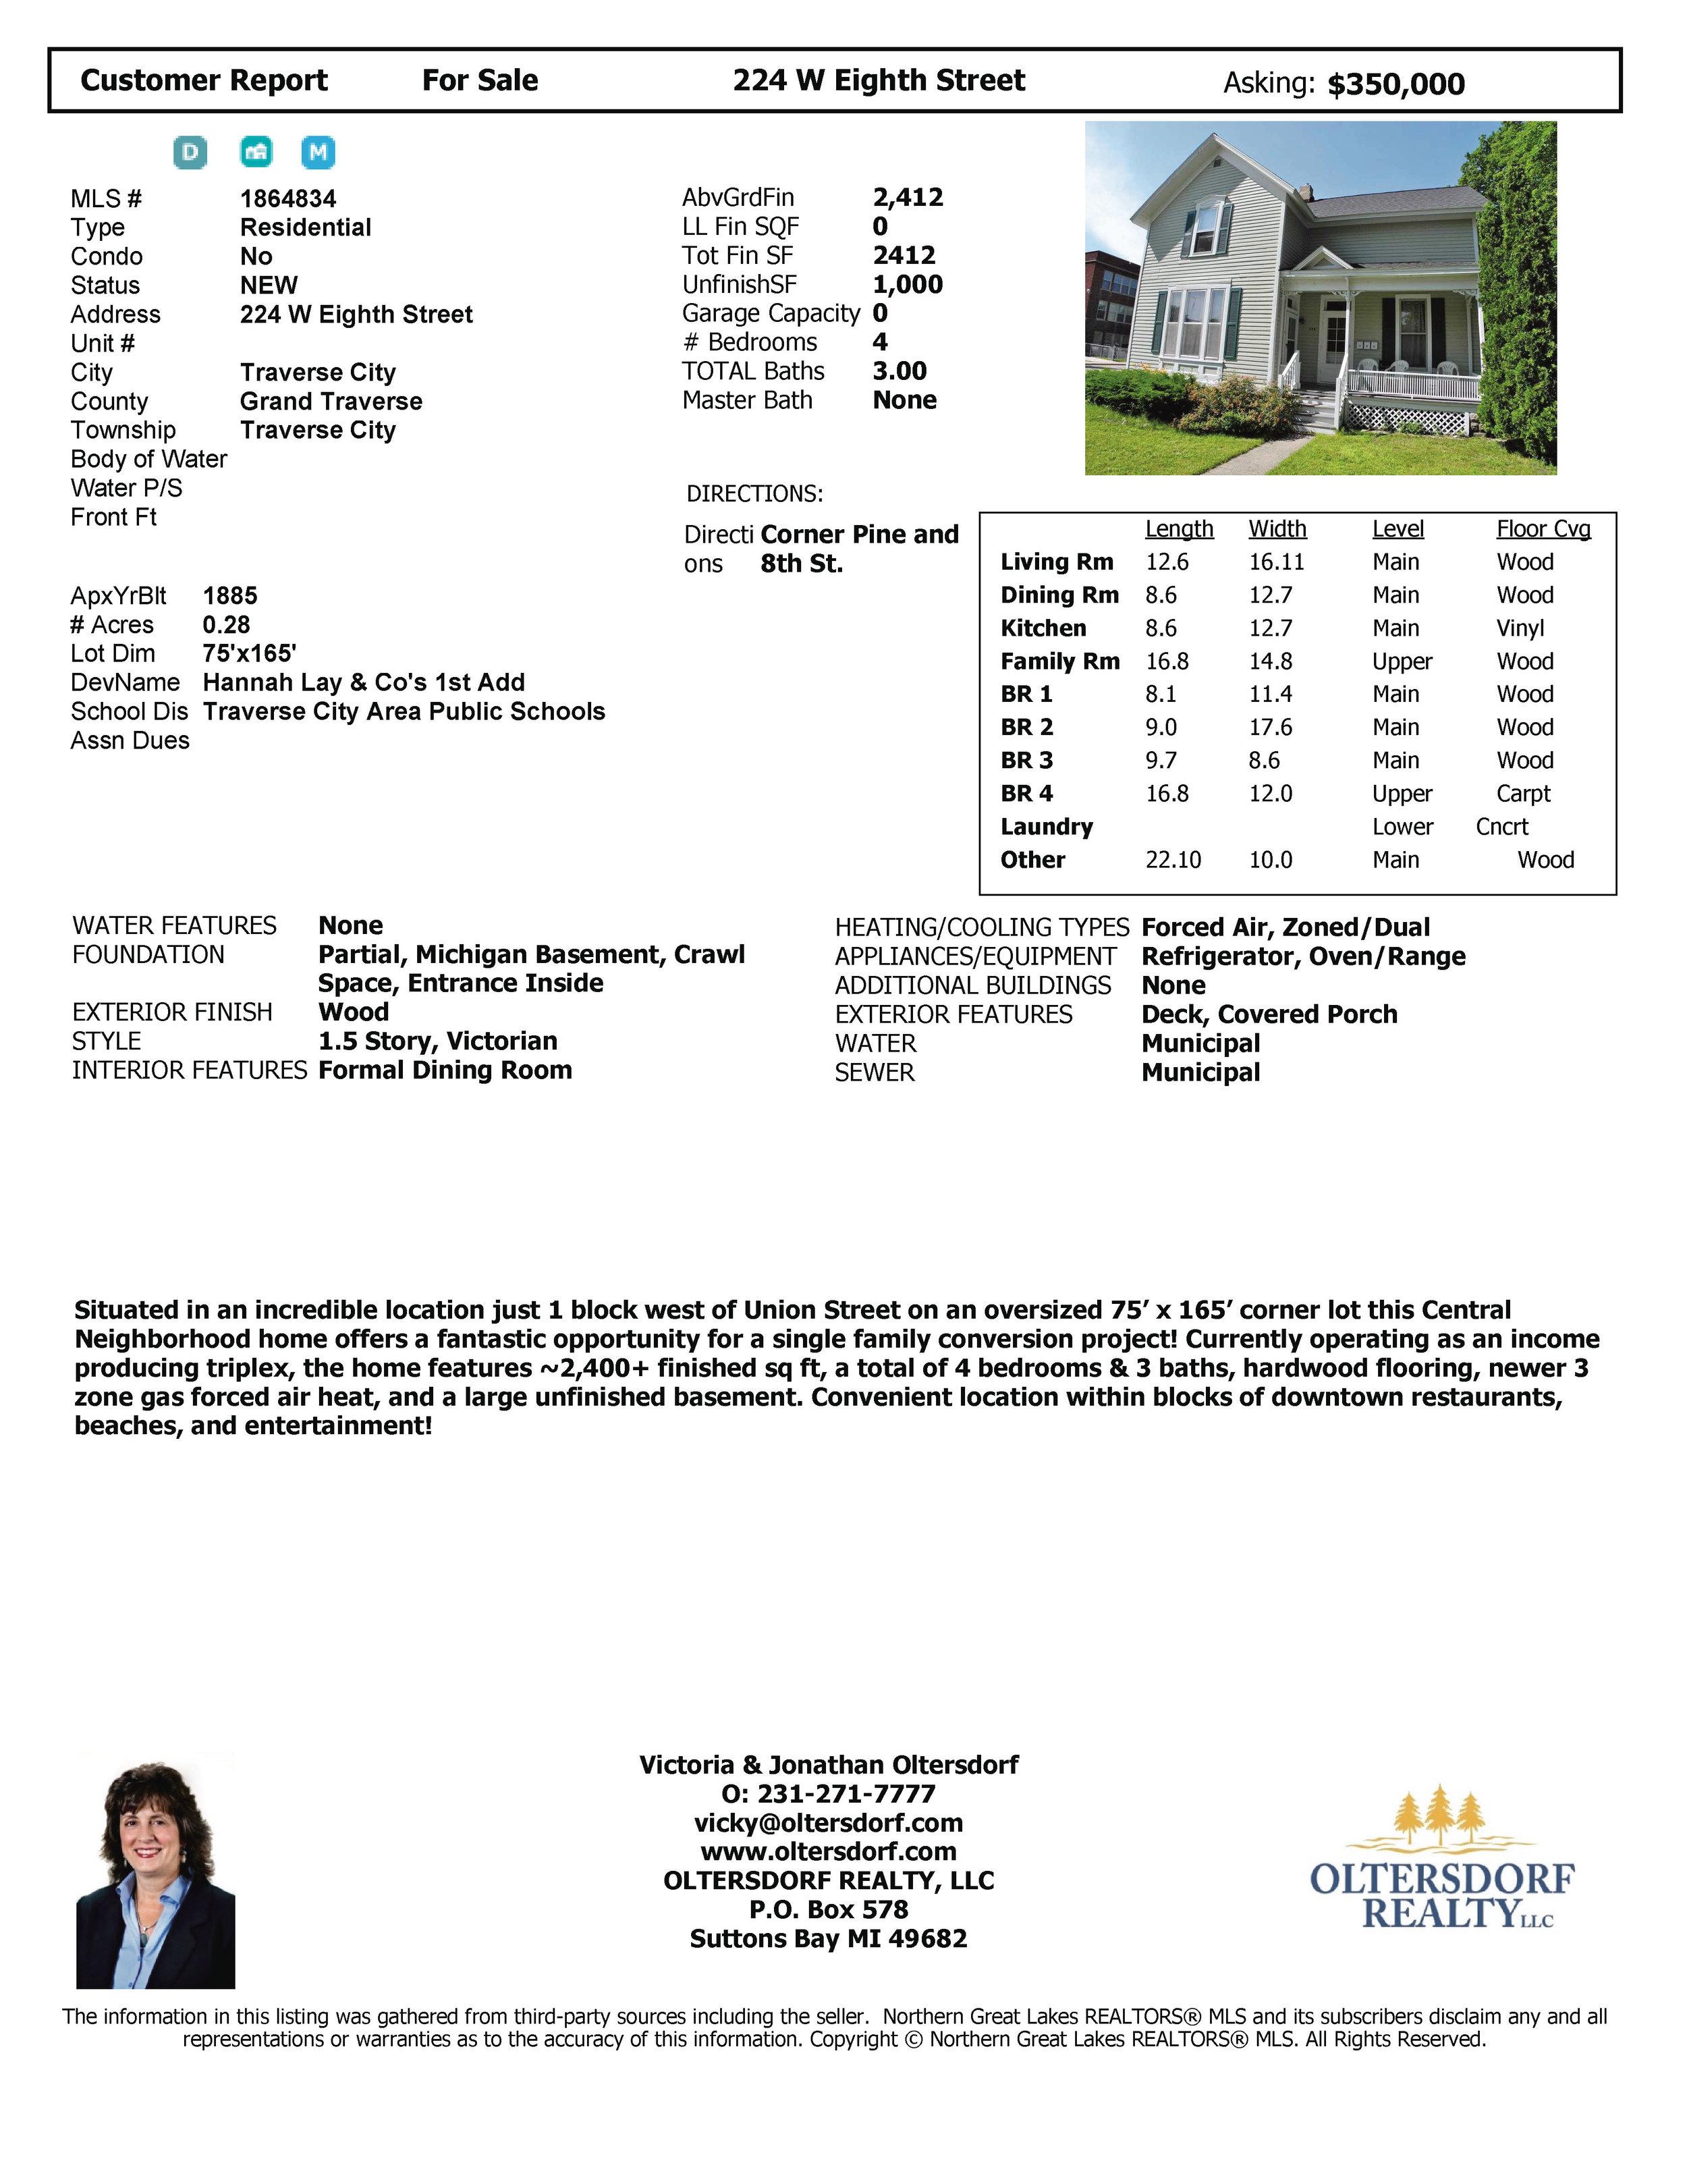 224 W Eighth St, Traverse City, MI – Downtown Traverse City Triplex Marketing Packet - For sale by Oltersdorf Realty LLC (10).jpg